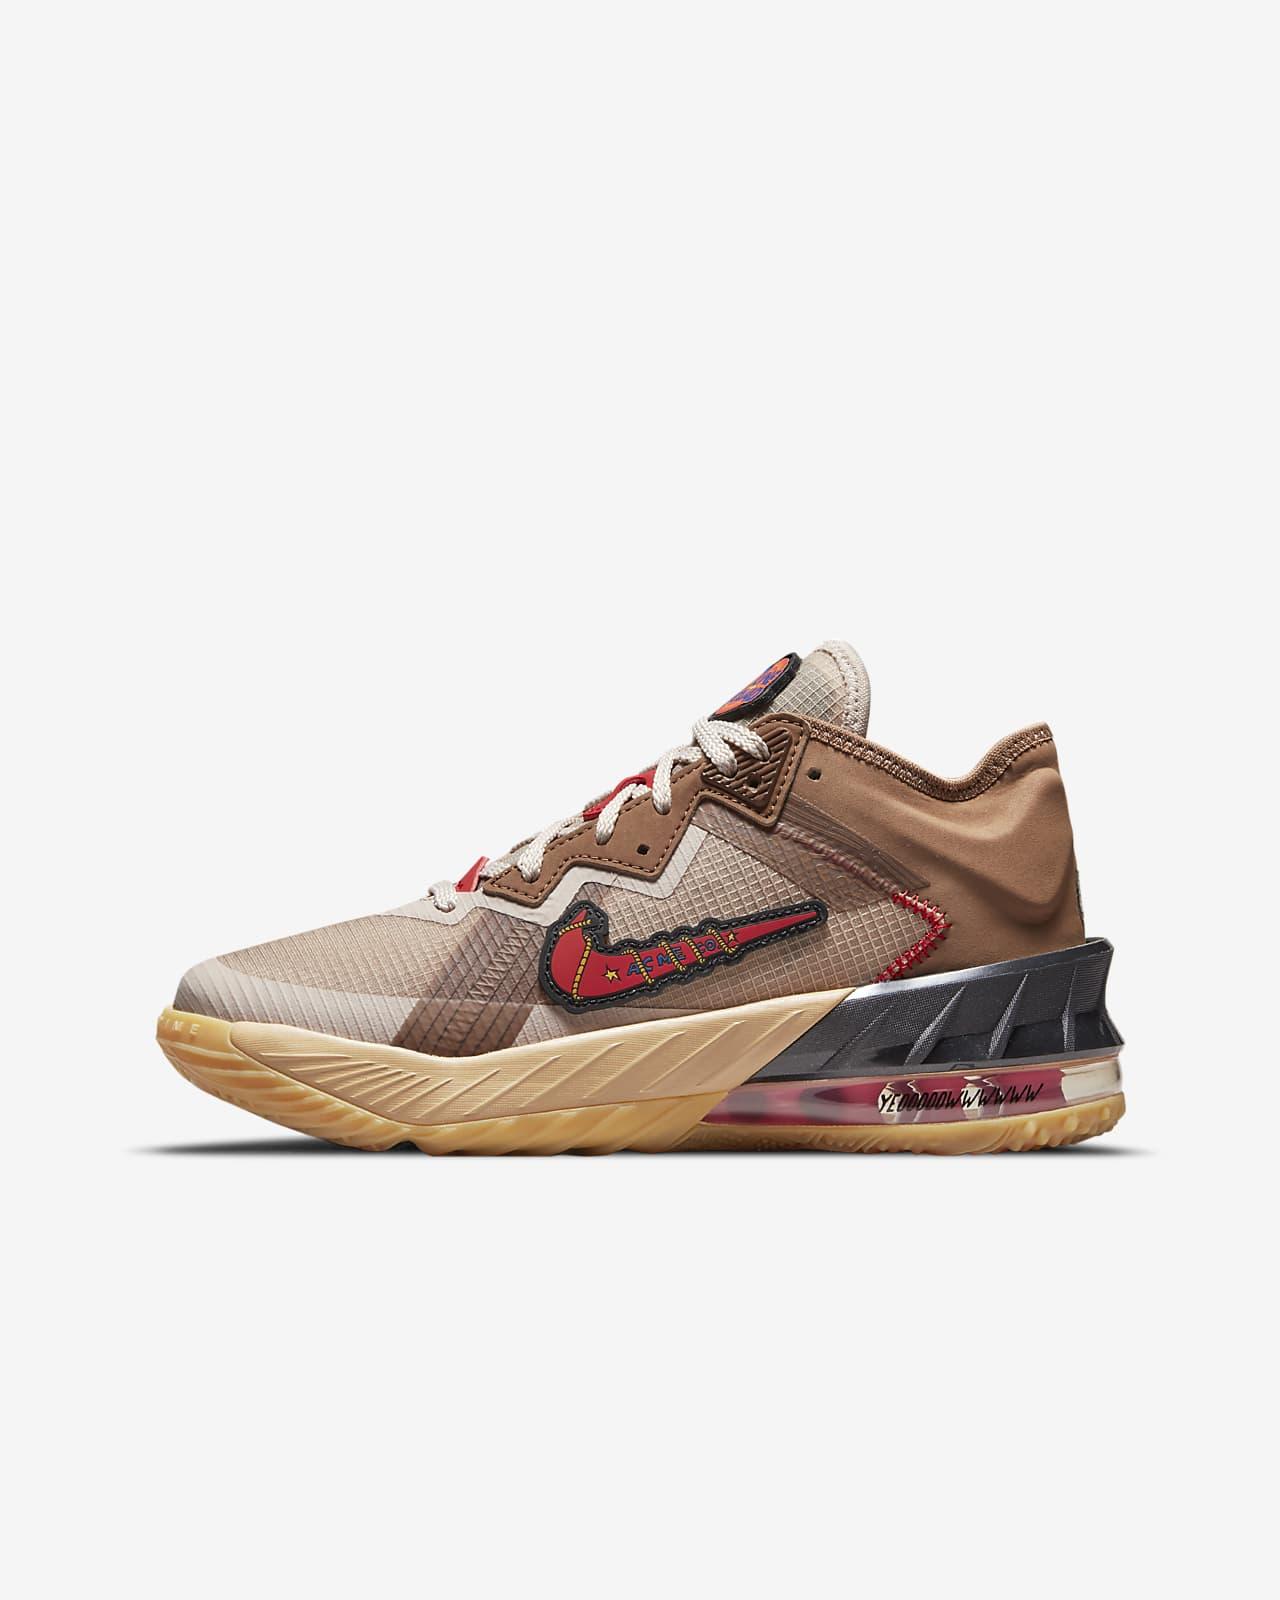 LeBron 18 Low 'Wile E. vs Roadrunner' Big Kids' Basketball Shoes